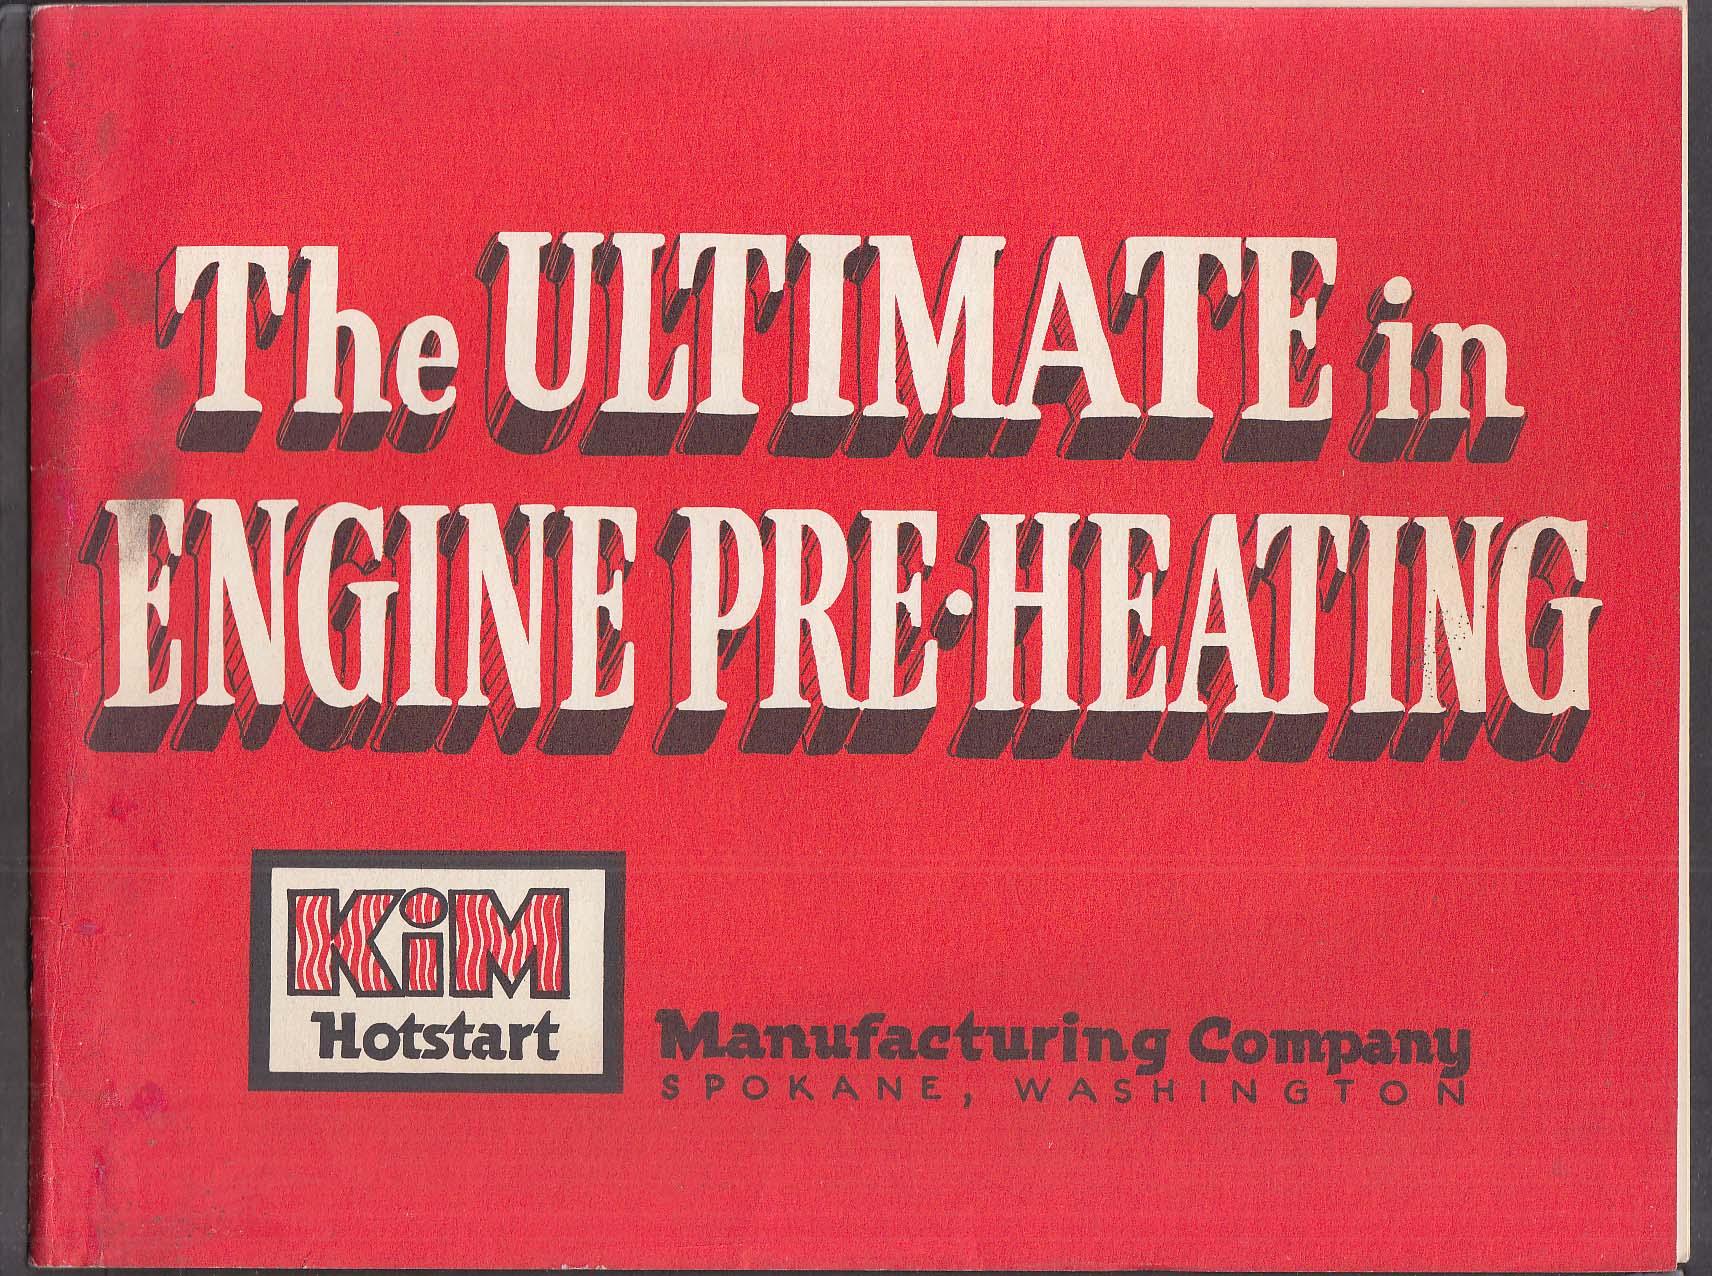 Kim Hotstart Diesel Engine Pre-Heater brochure 1960s